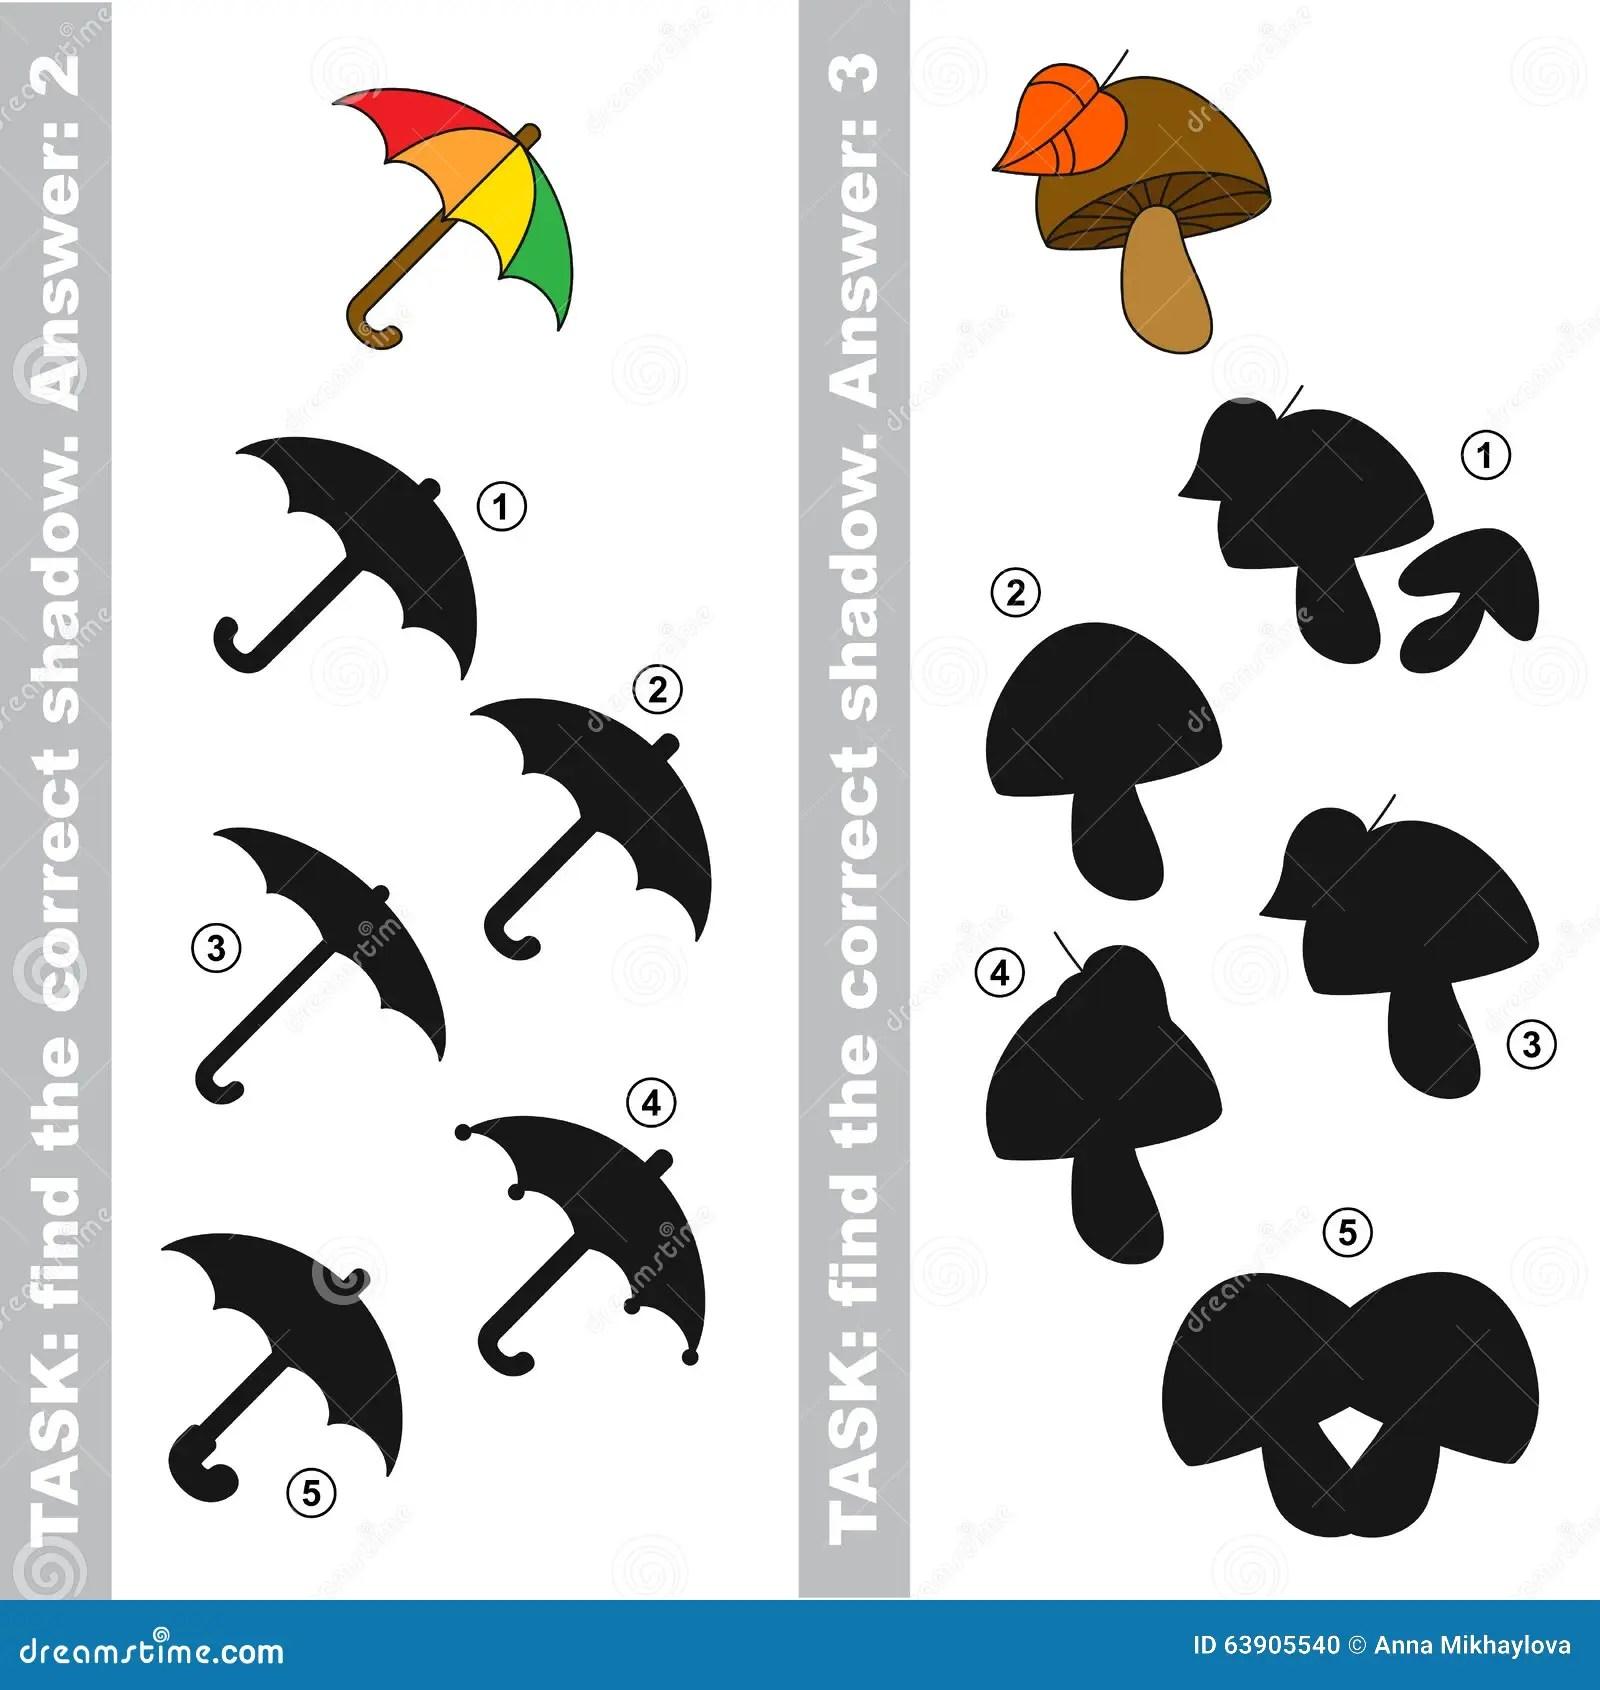 Mushroom And Umbrella Find True Correct Shadow Stock